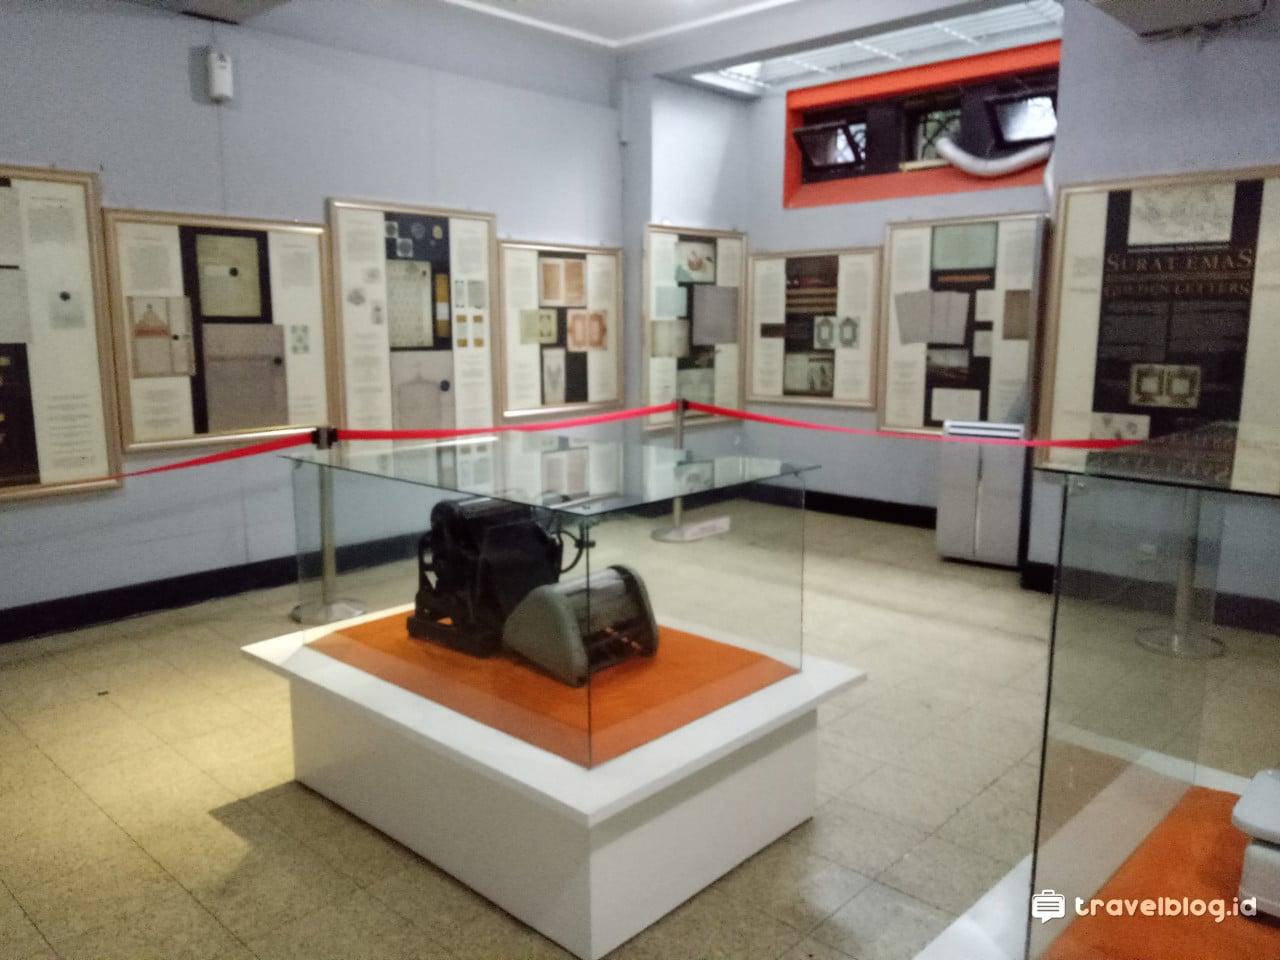 20 Daftar Museum Jawa Barat Jabar Travel Blog Indonesia Img20160720124054